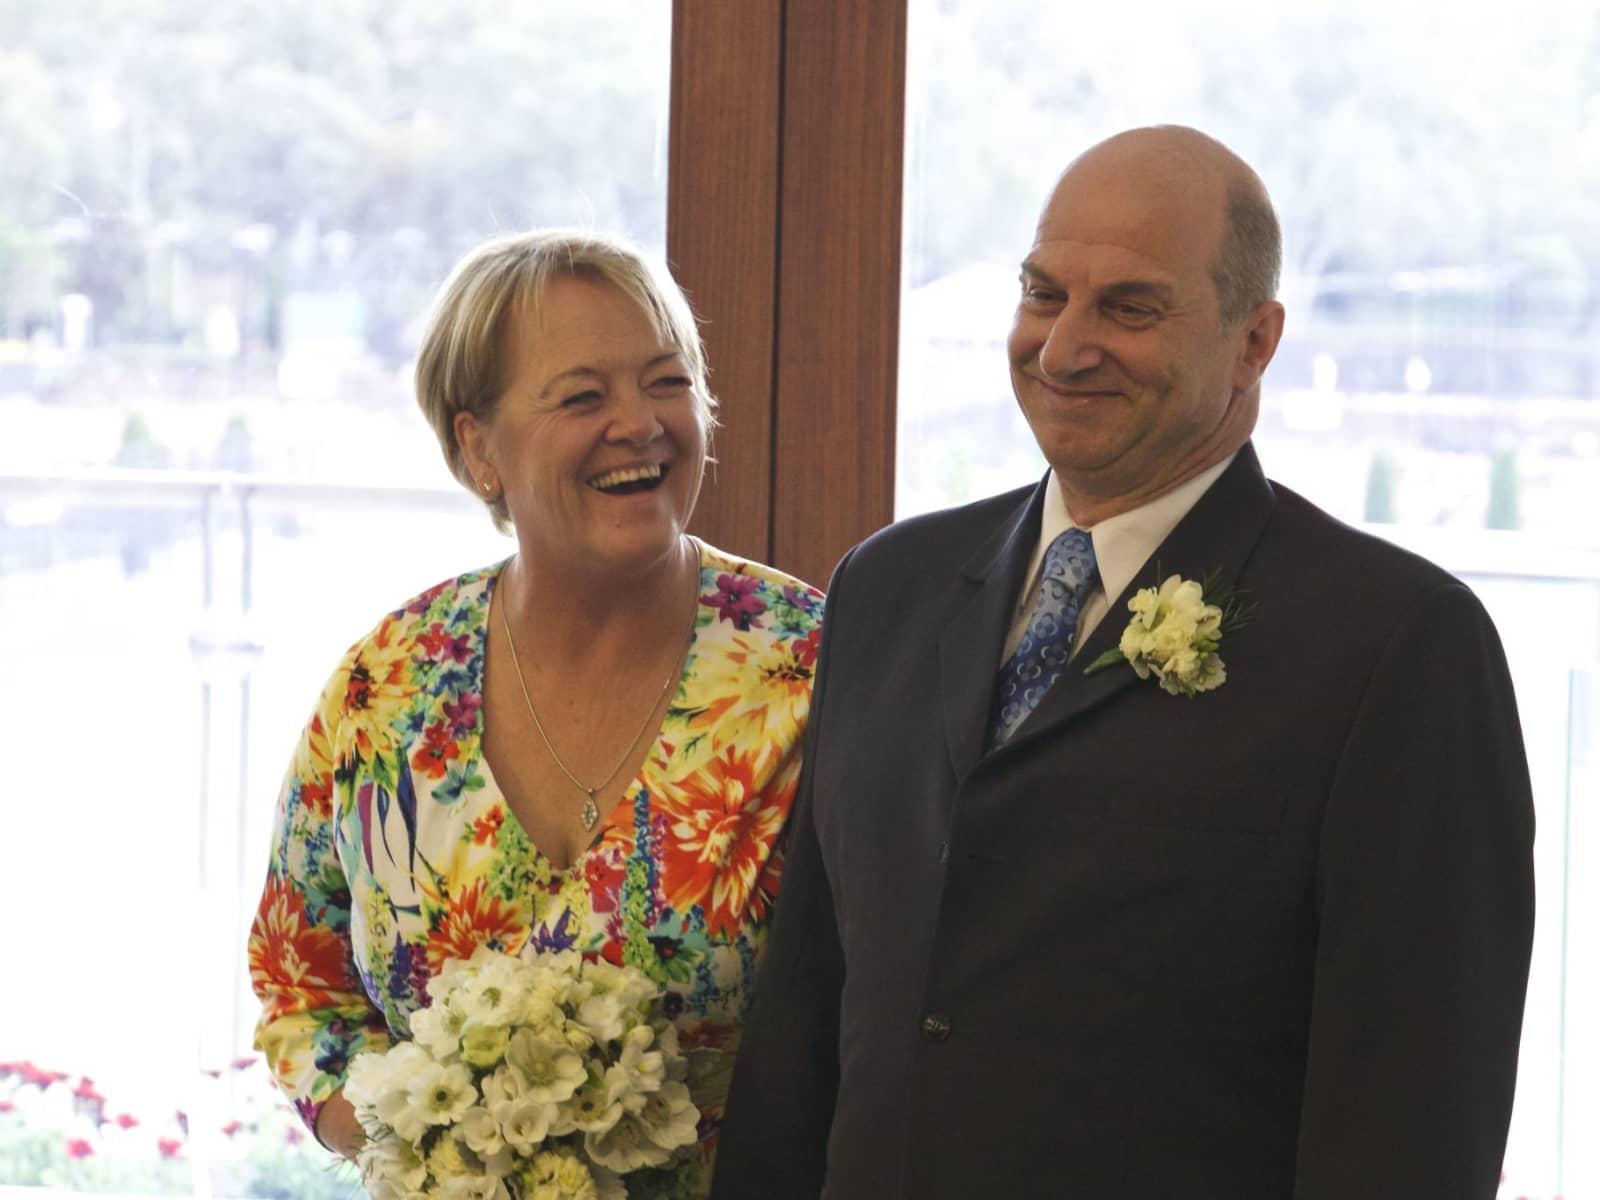 Susan & Alastair from Canberra, Australian Capital Territory, Australia